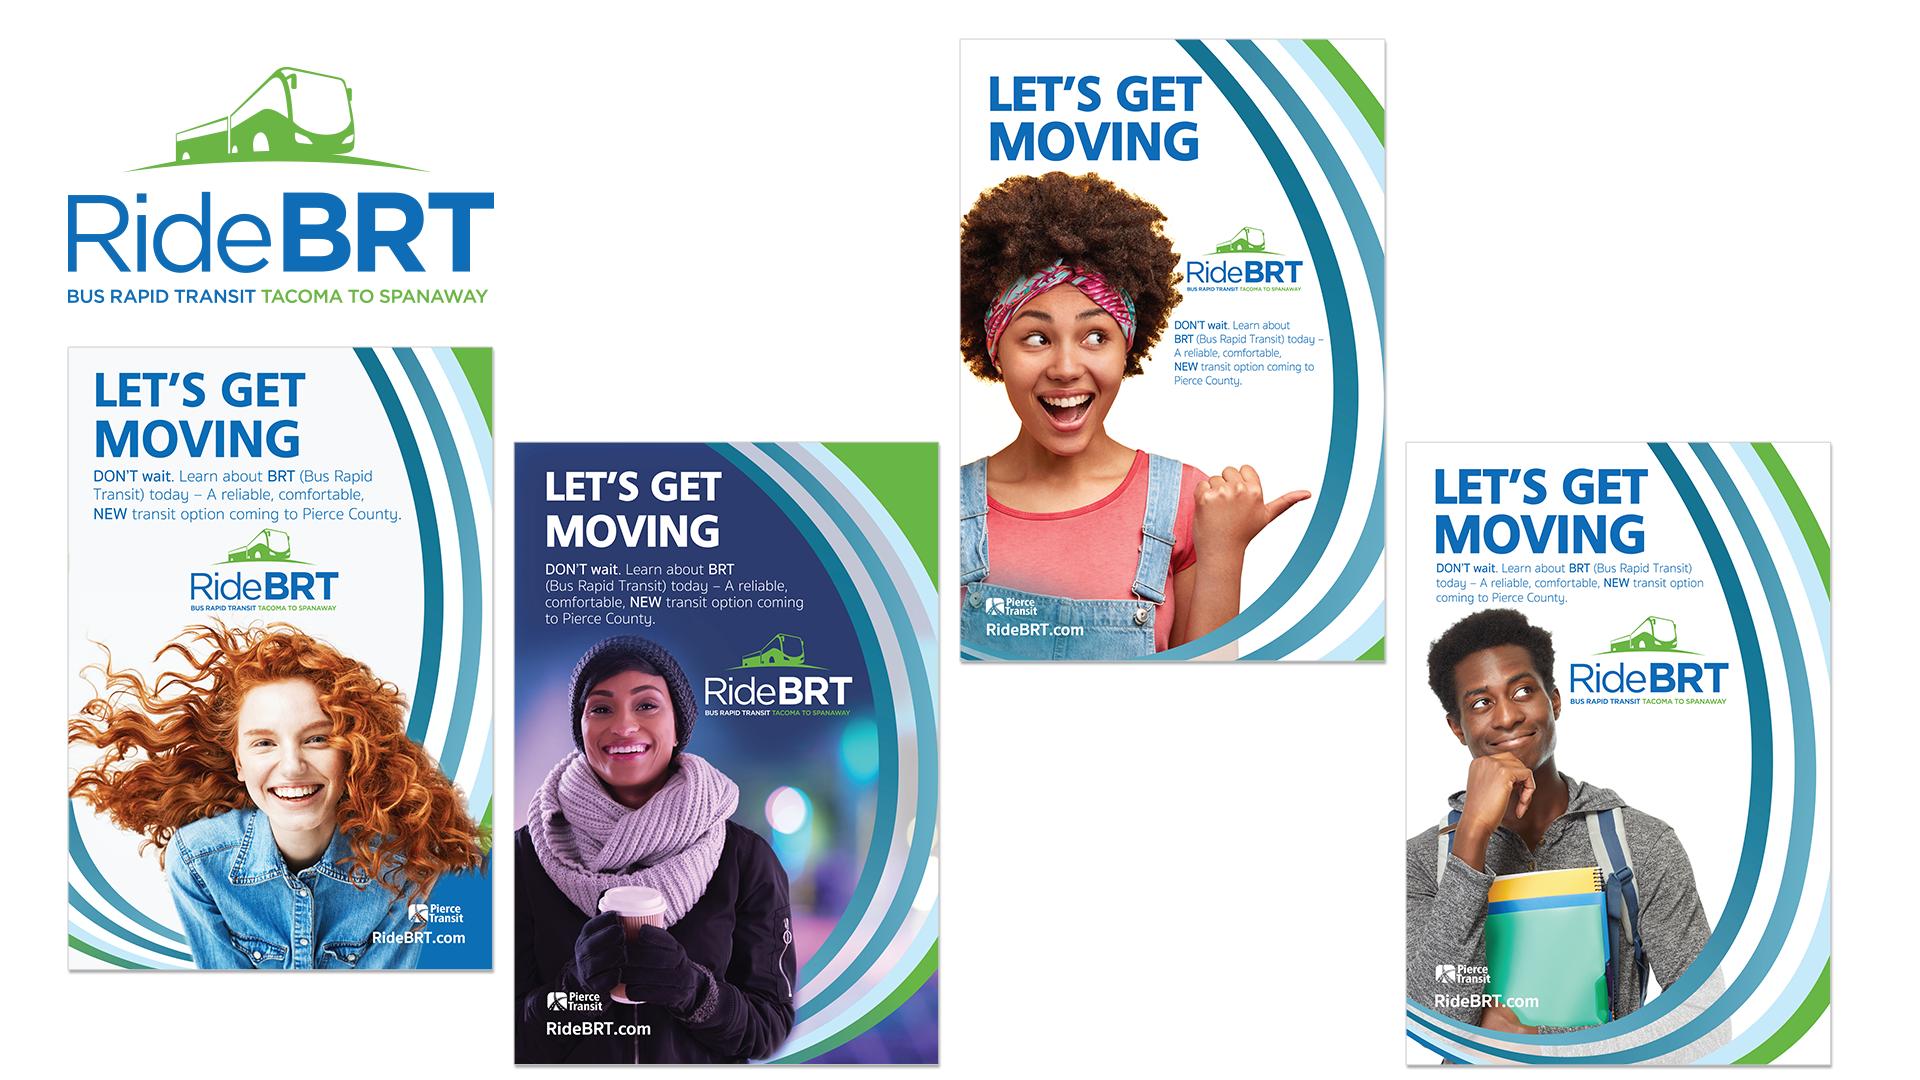 Pierce Transit BRT branding/creative campaign platform with colors, styles, messaging